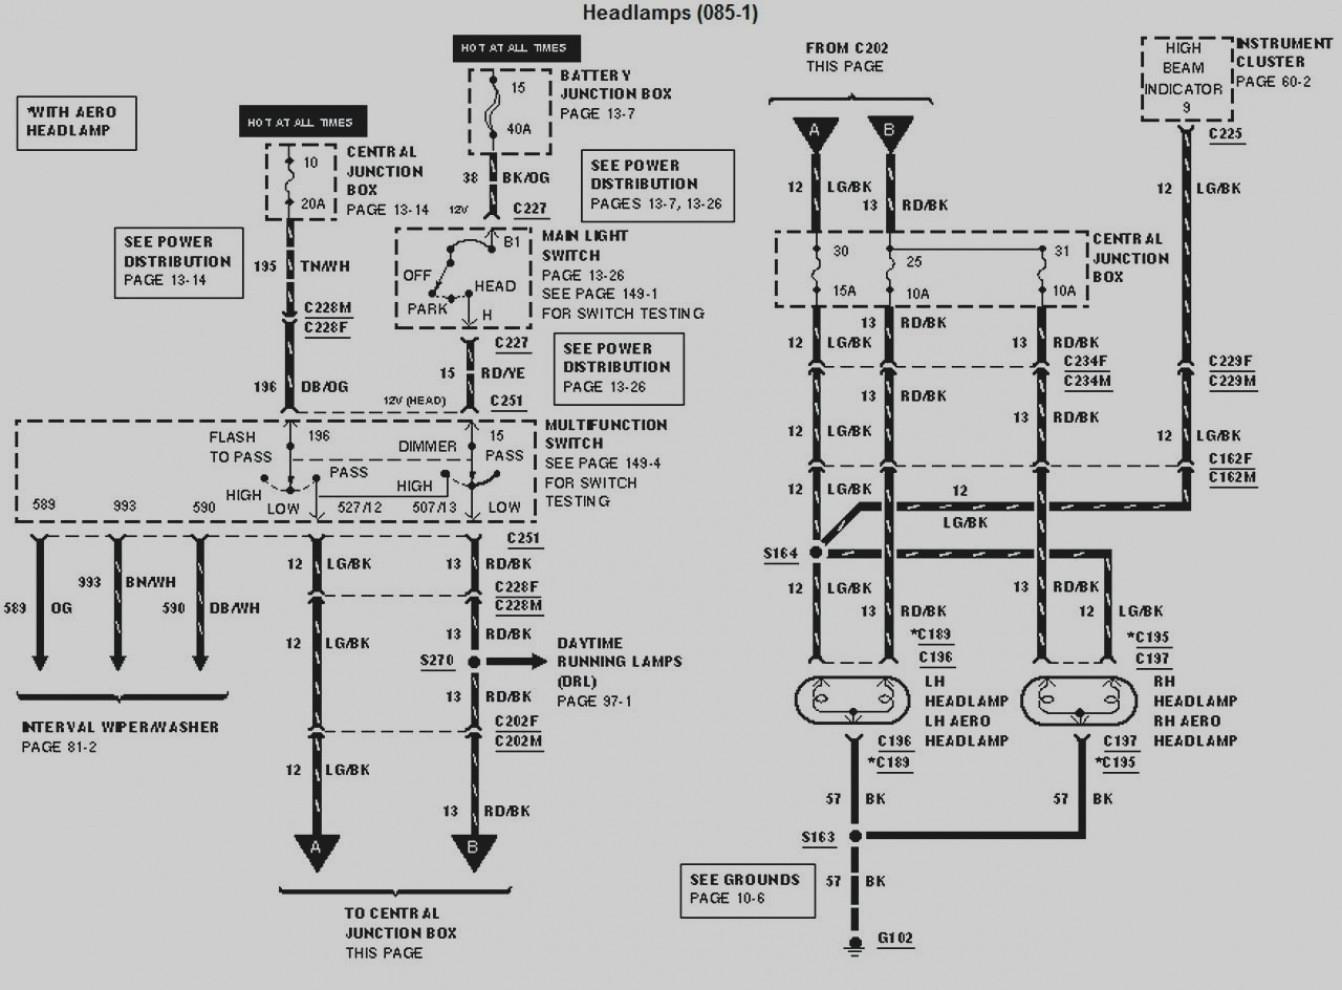 1997 ford f150 headlight switch wiring diagram hyphae fungi cell hk42fz009 sample